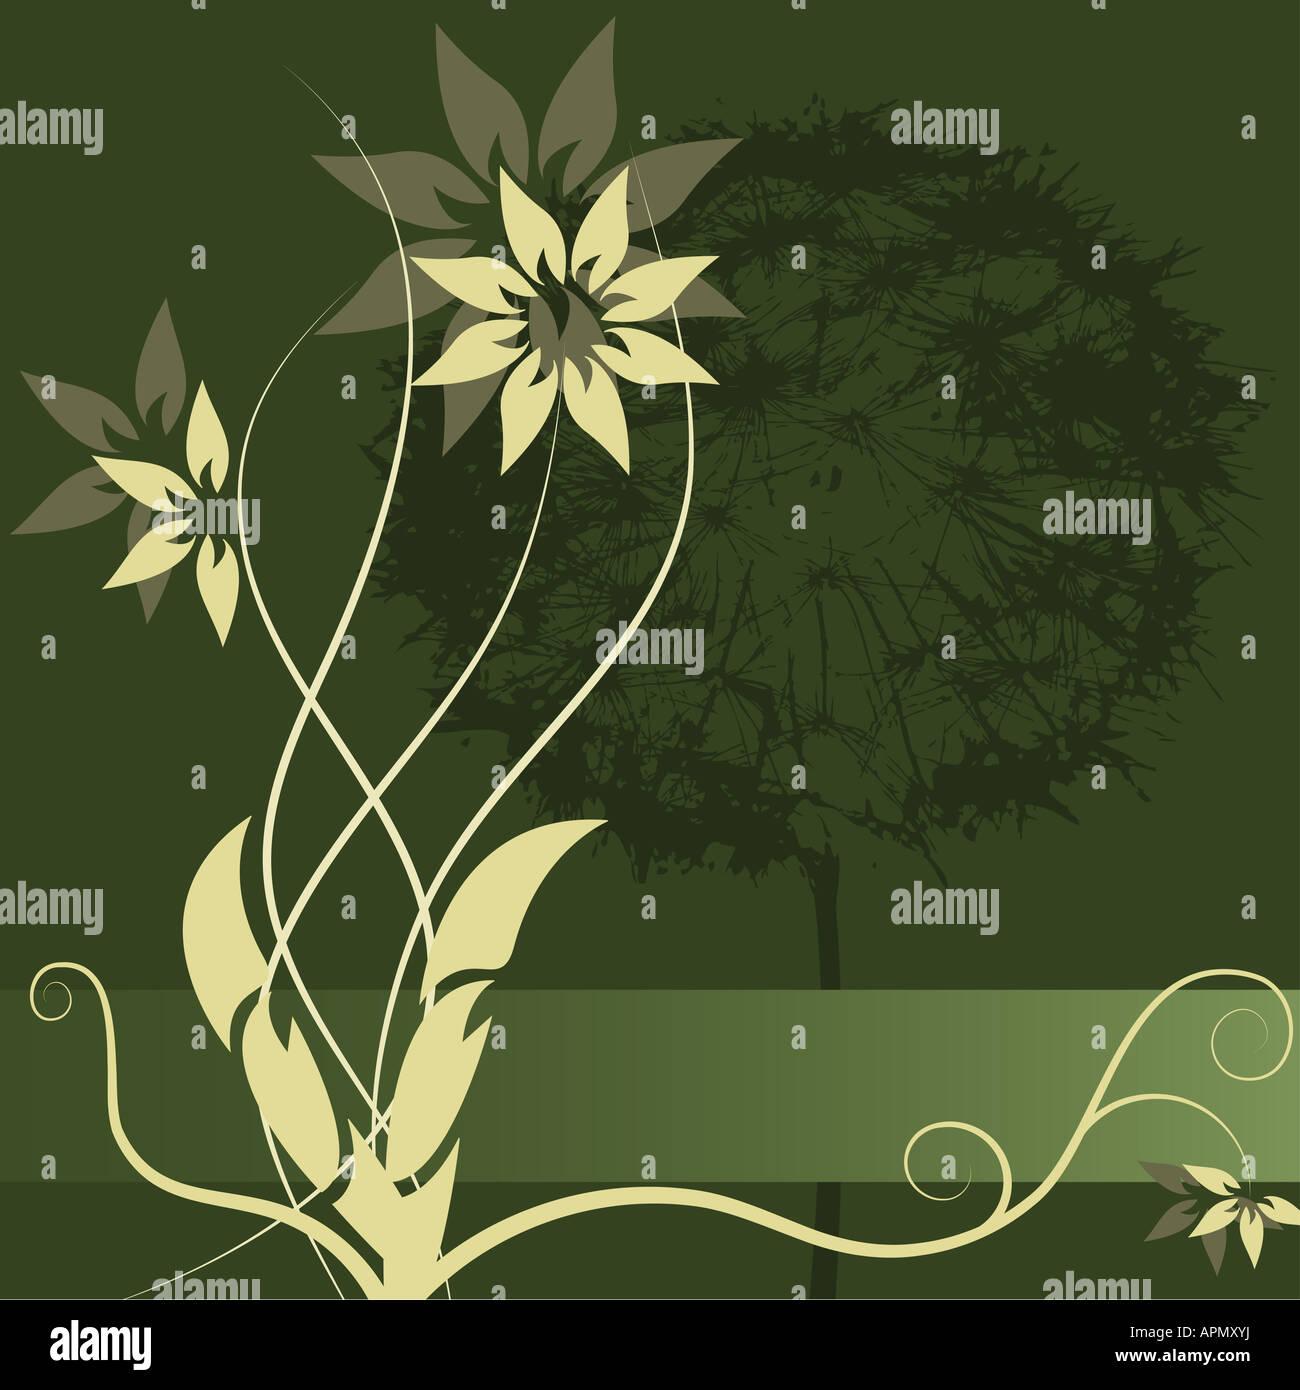 Graphic vector flower label design - Stock Image